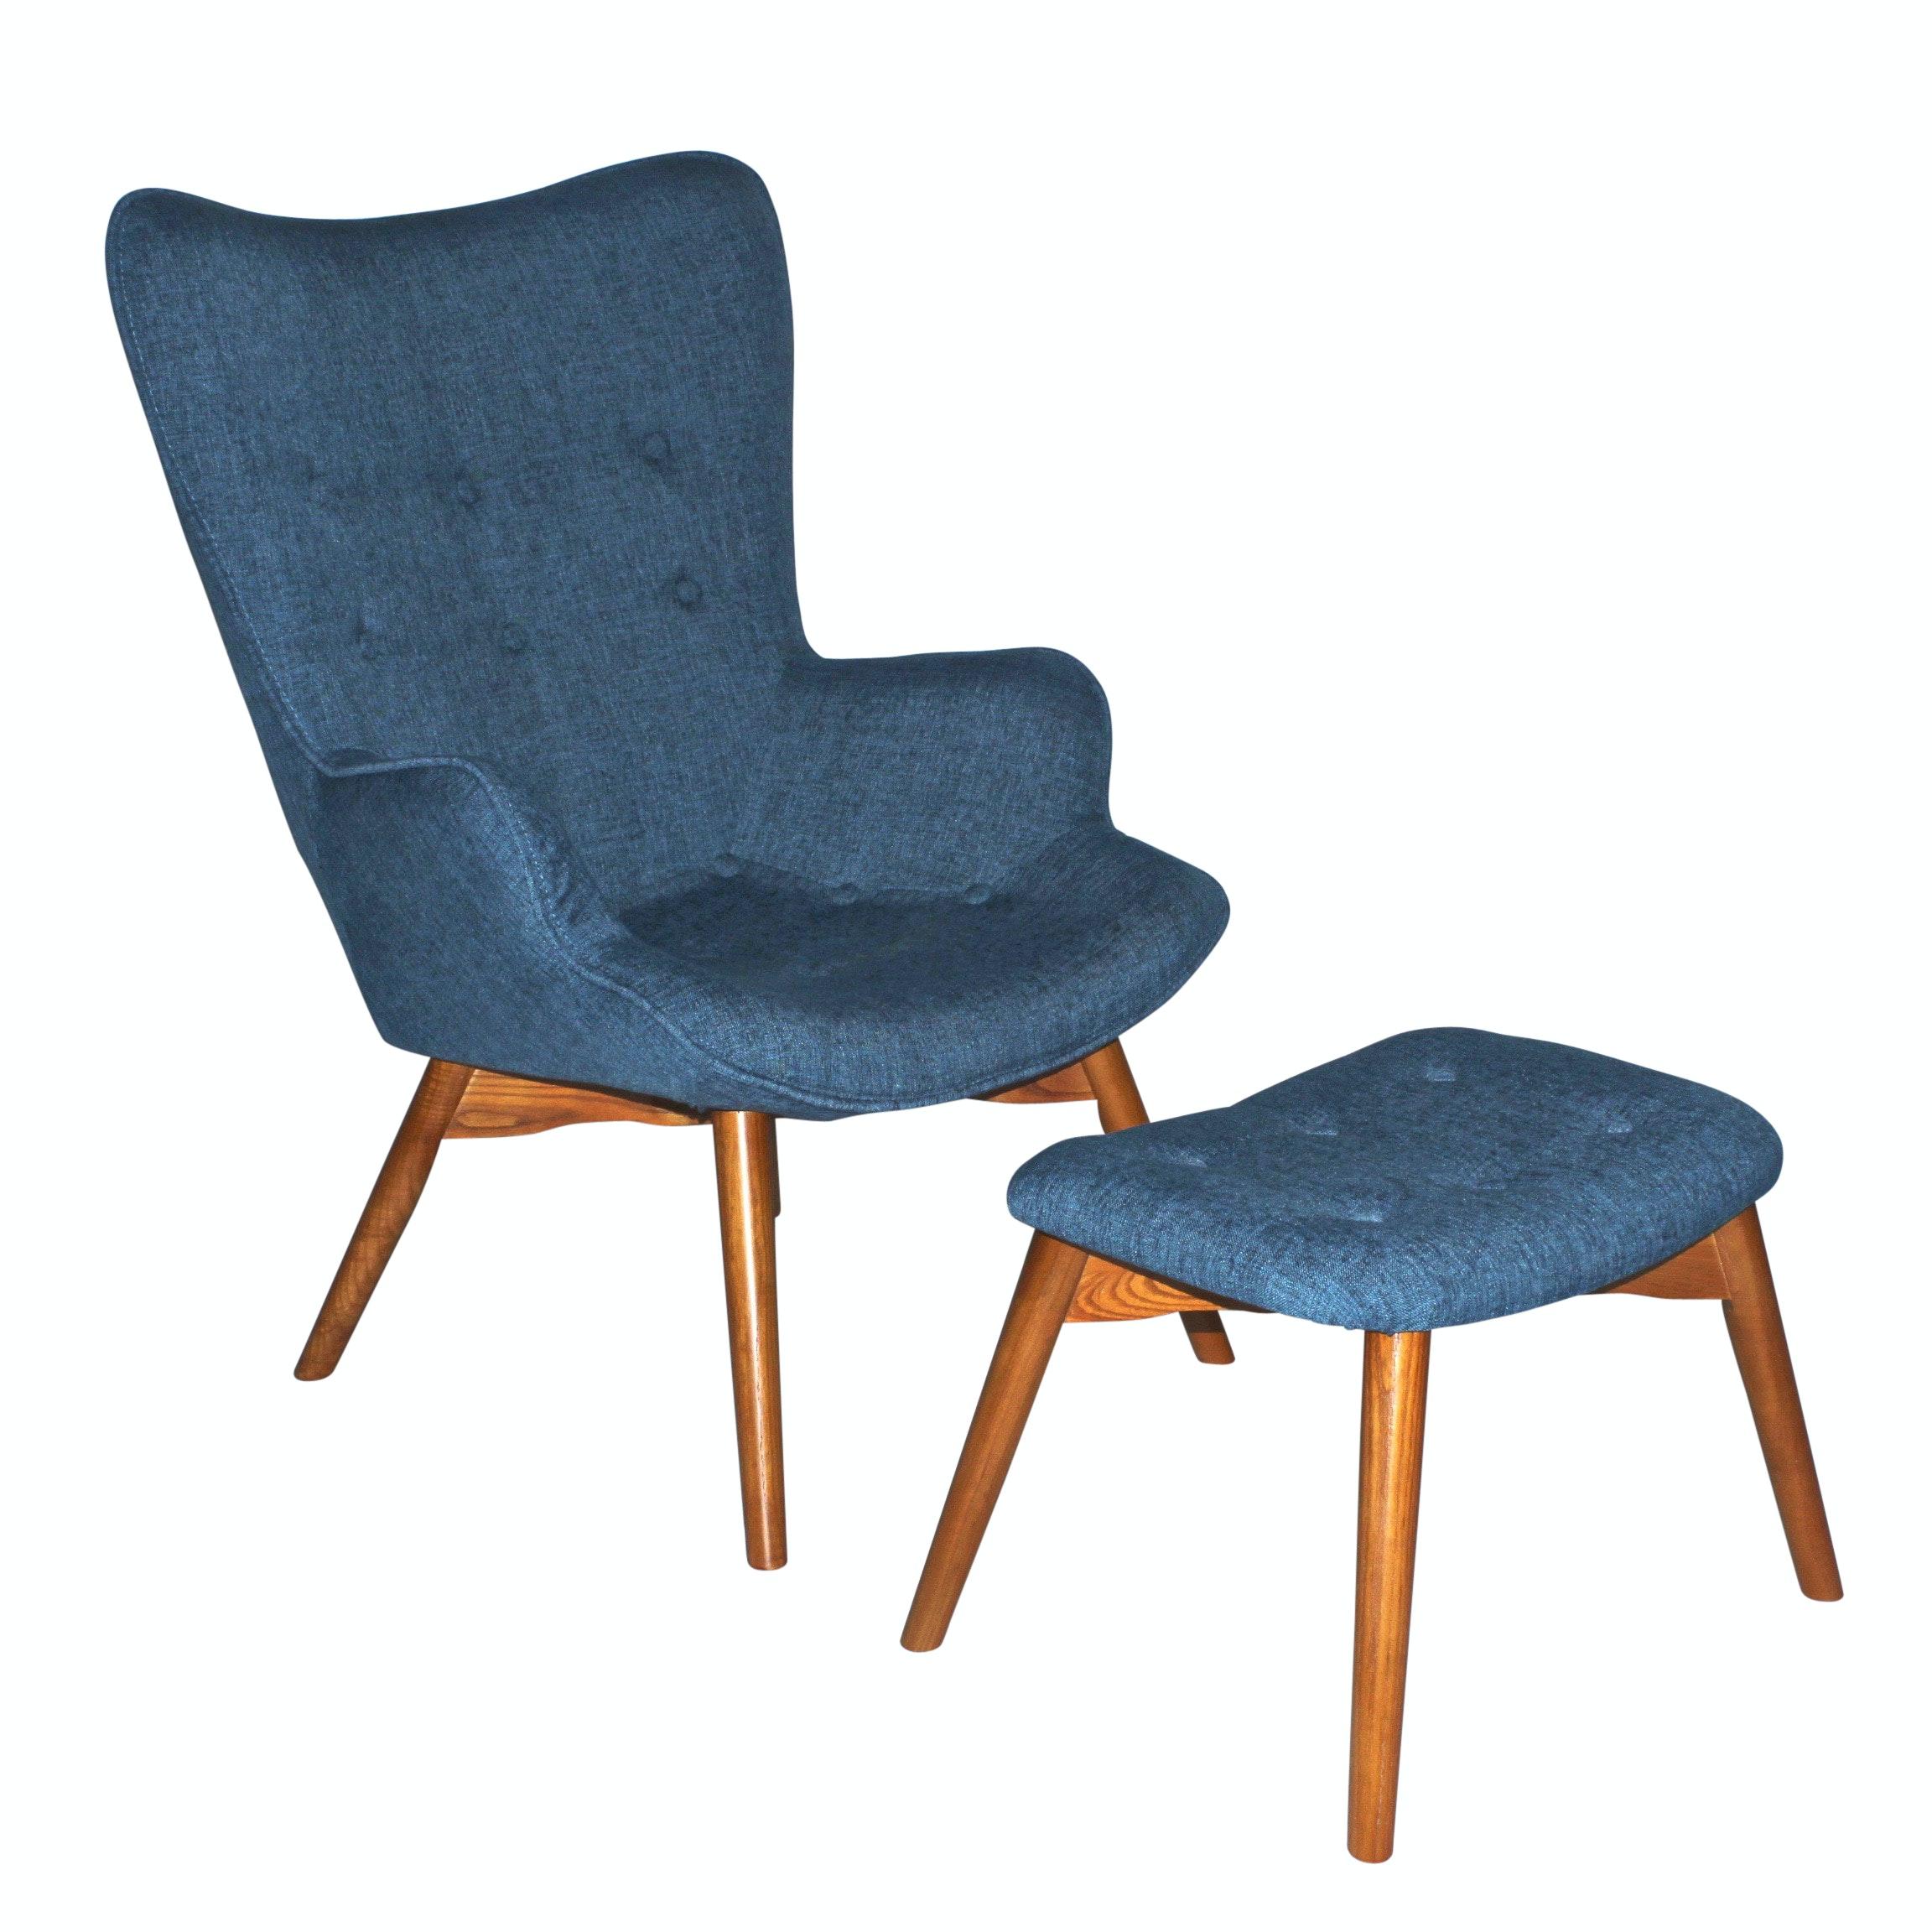 Linyi Tiancai Timber Co.,Ltd. Armchair and Ottoman, Contemporary